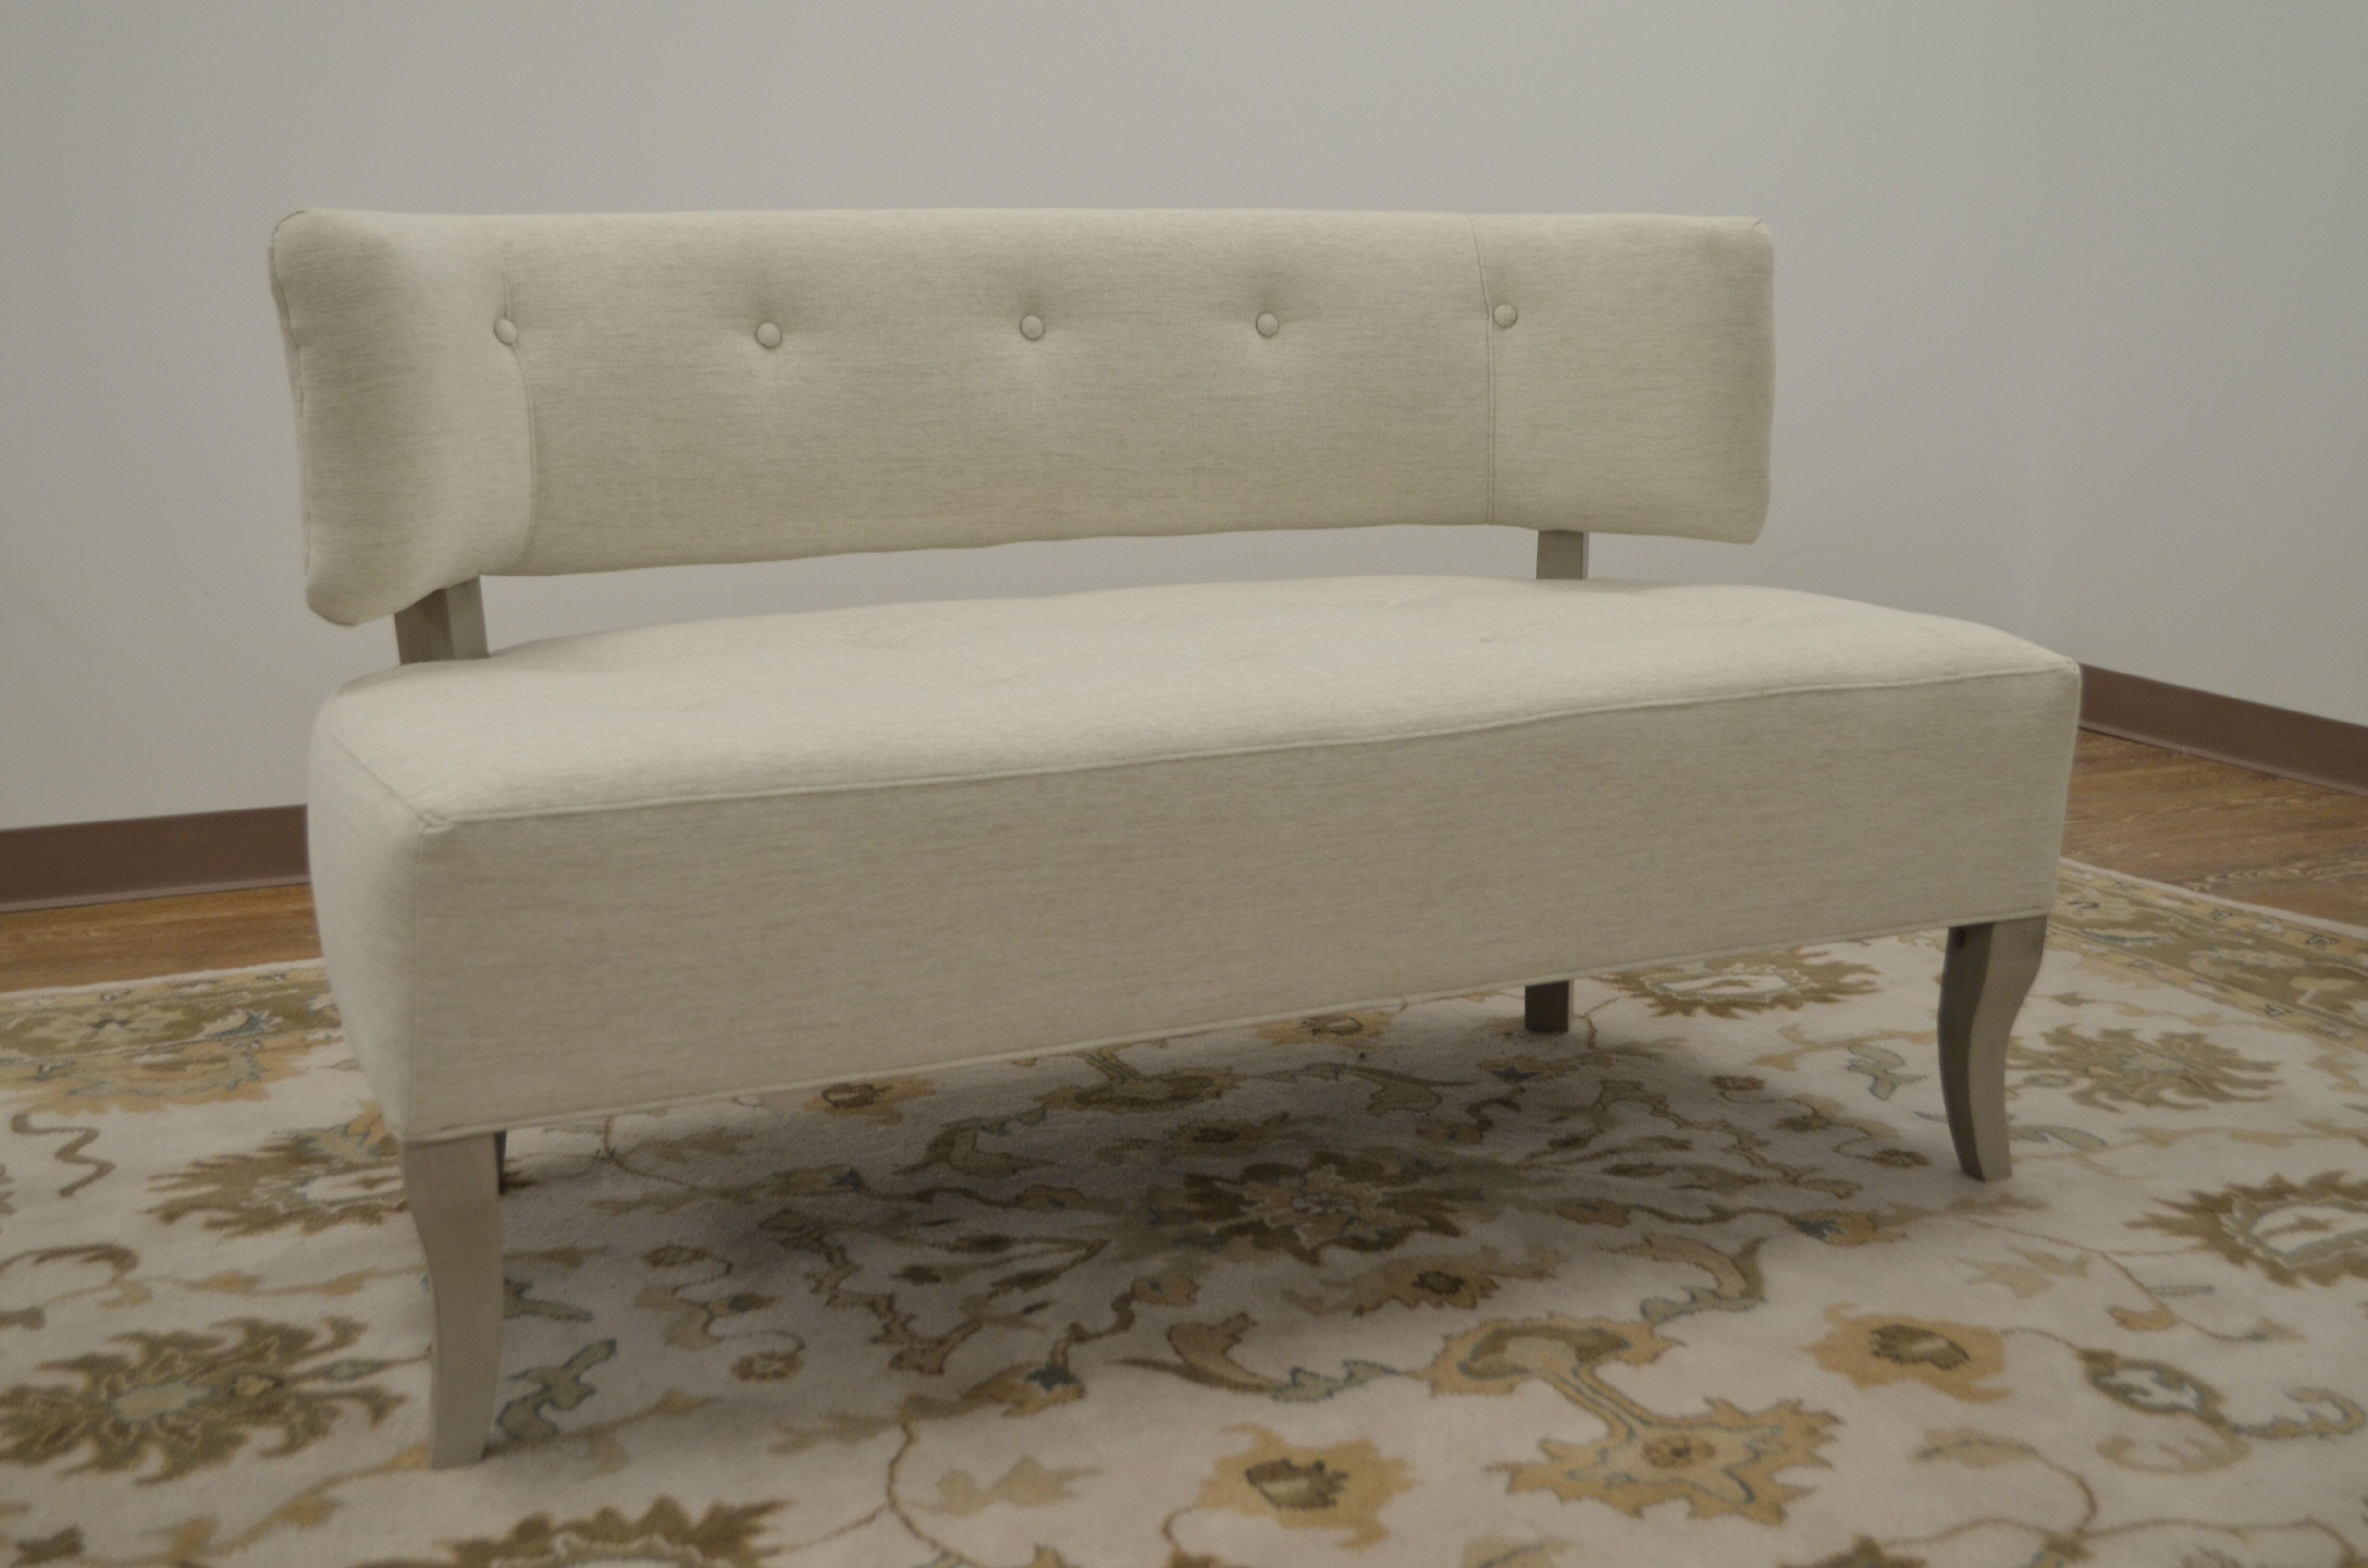 Rachael Ray Home Settee Upholstered Bedroom Bench | Wayfair